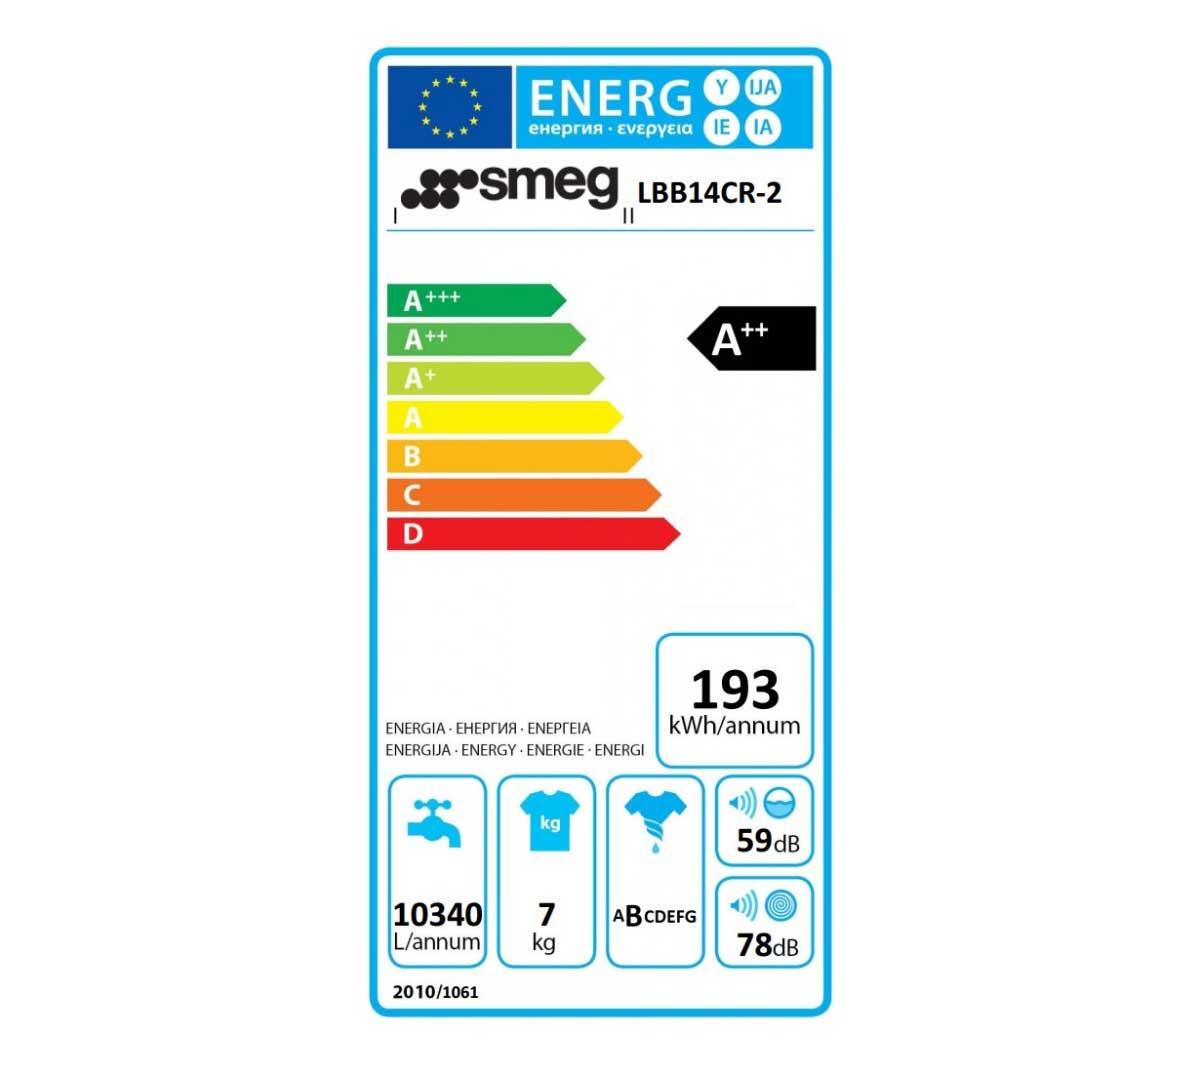 Etichetta energetica Lavatrice Smeg LBB14CR2